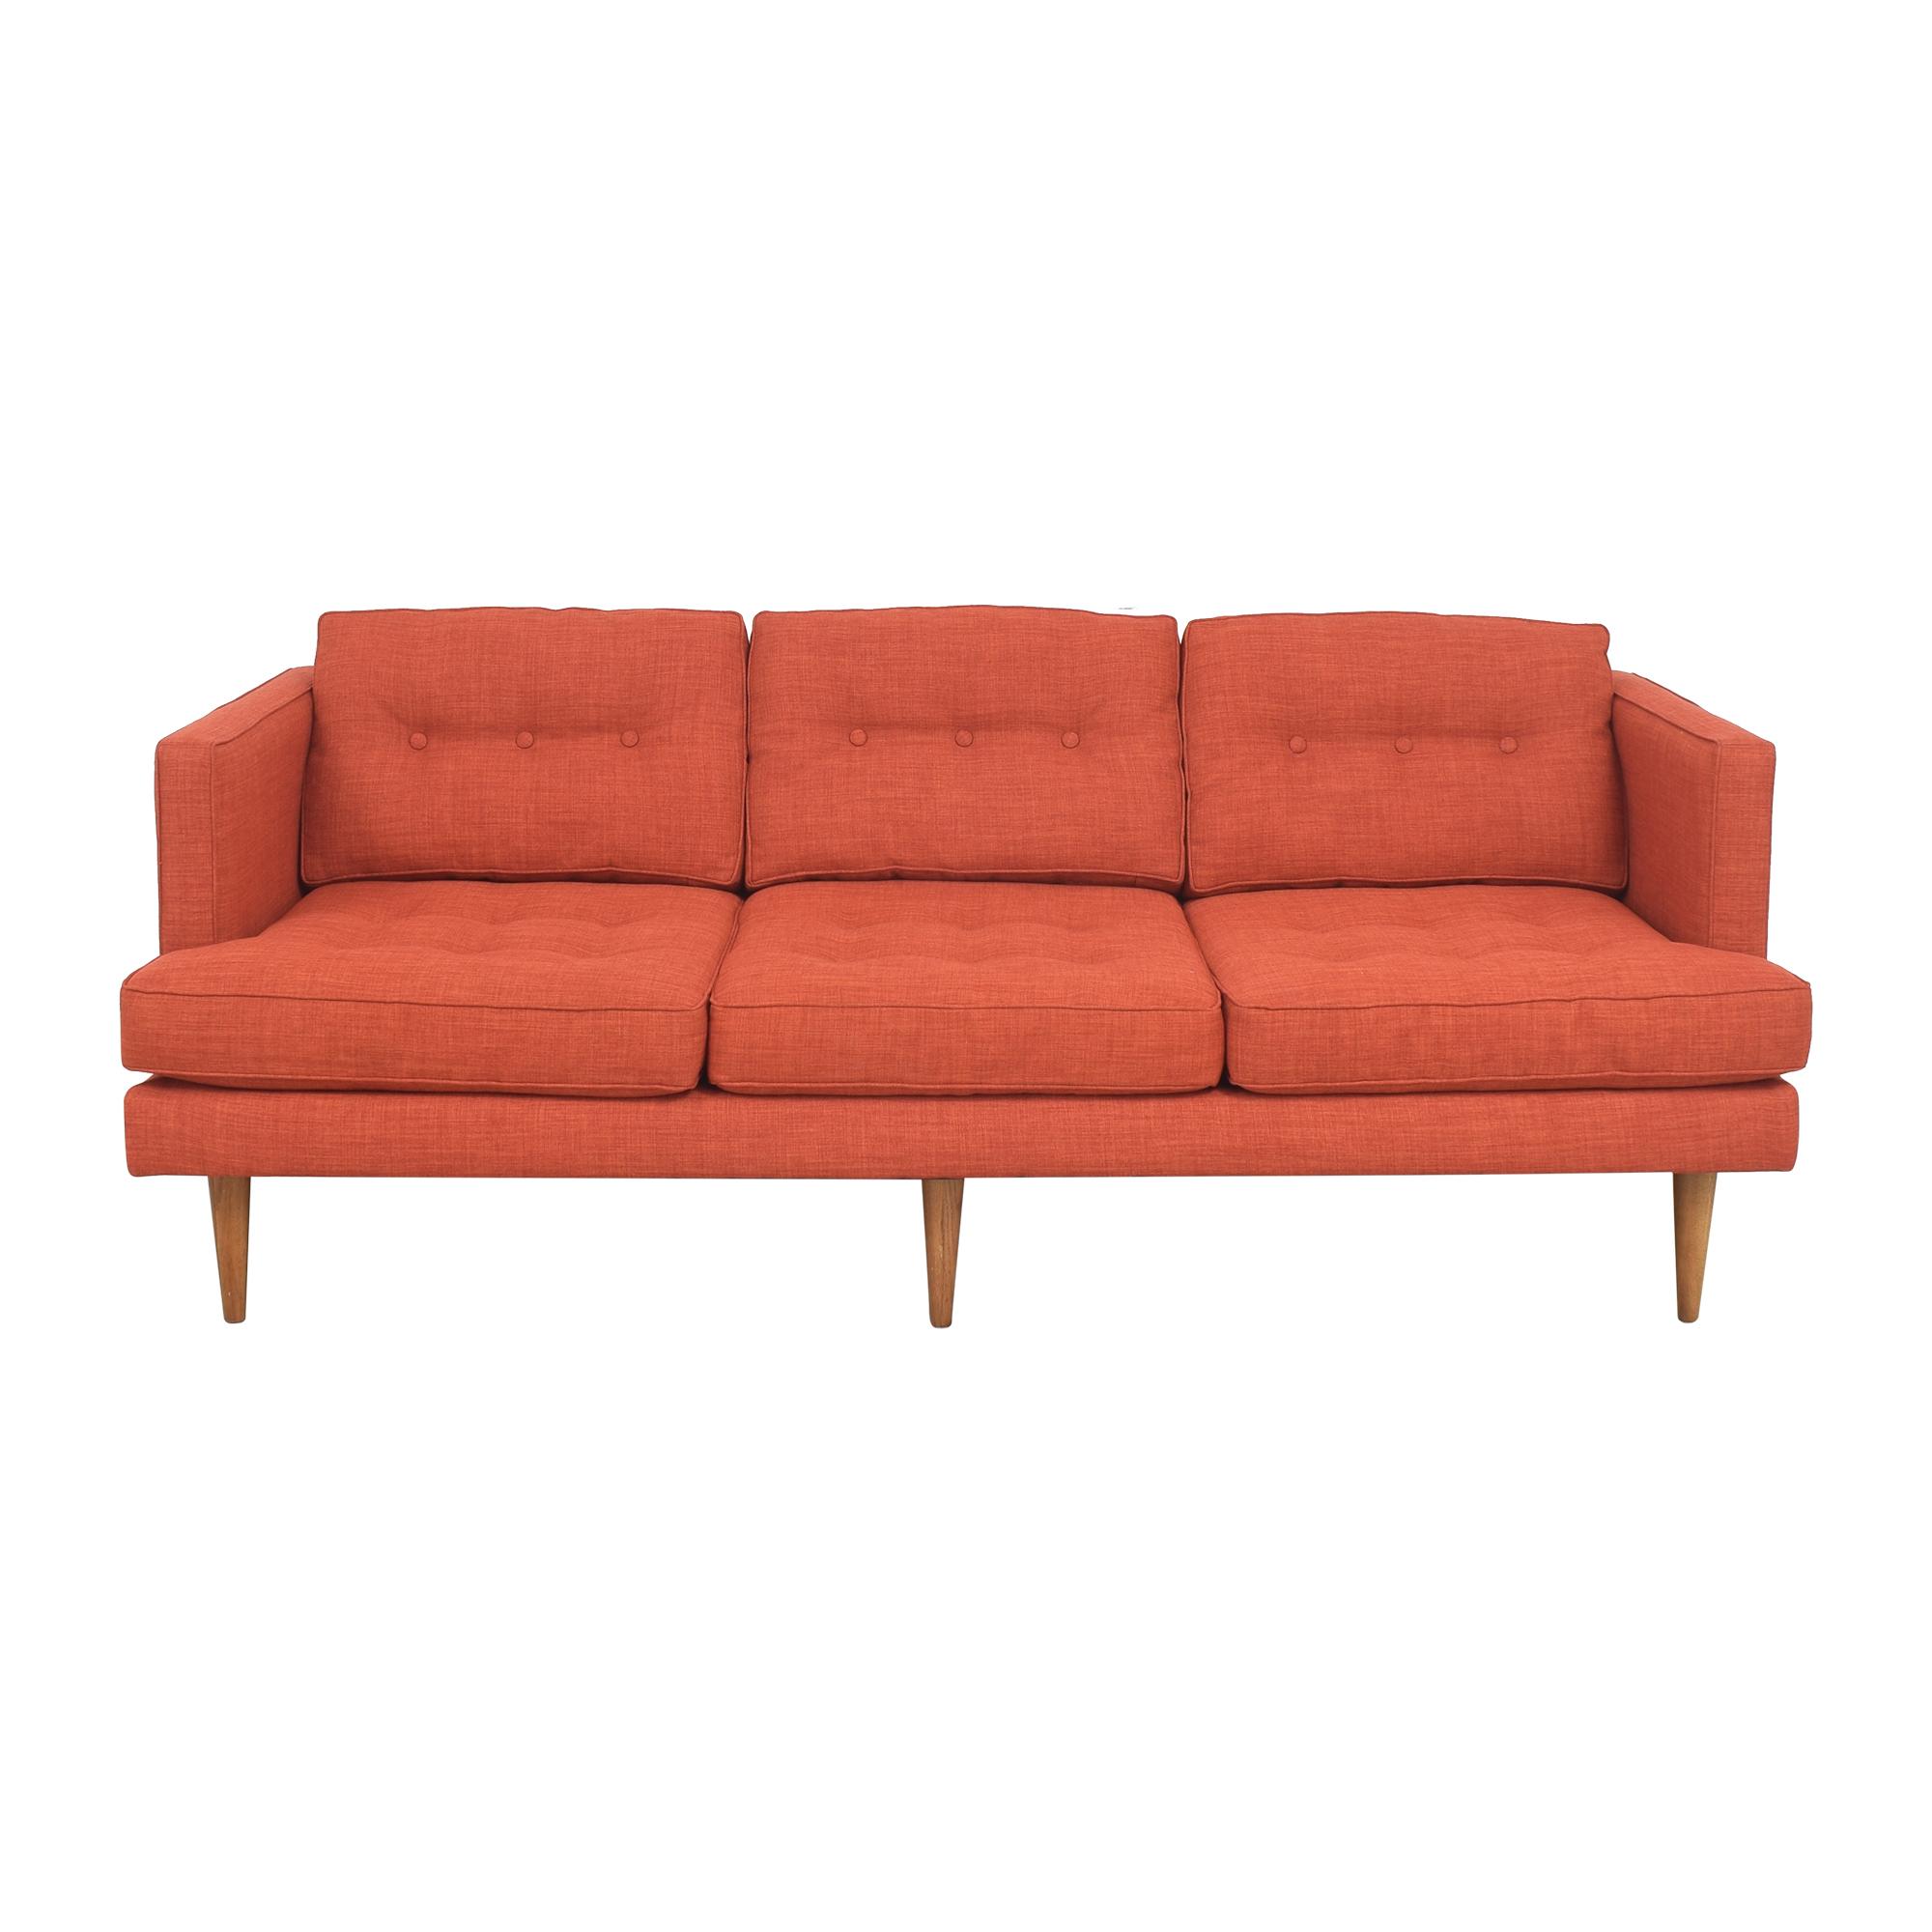 West Elm West Elm Burrow Nomad Three Cushion Sofa second hand